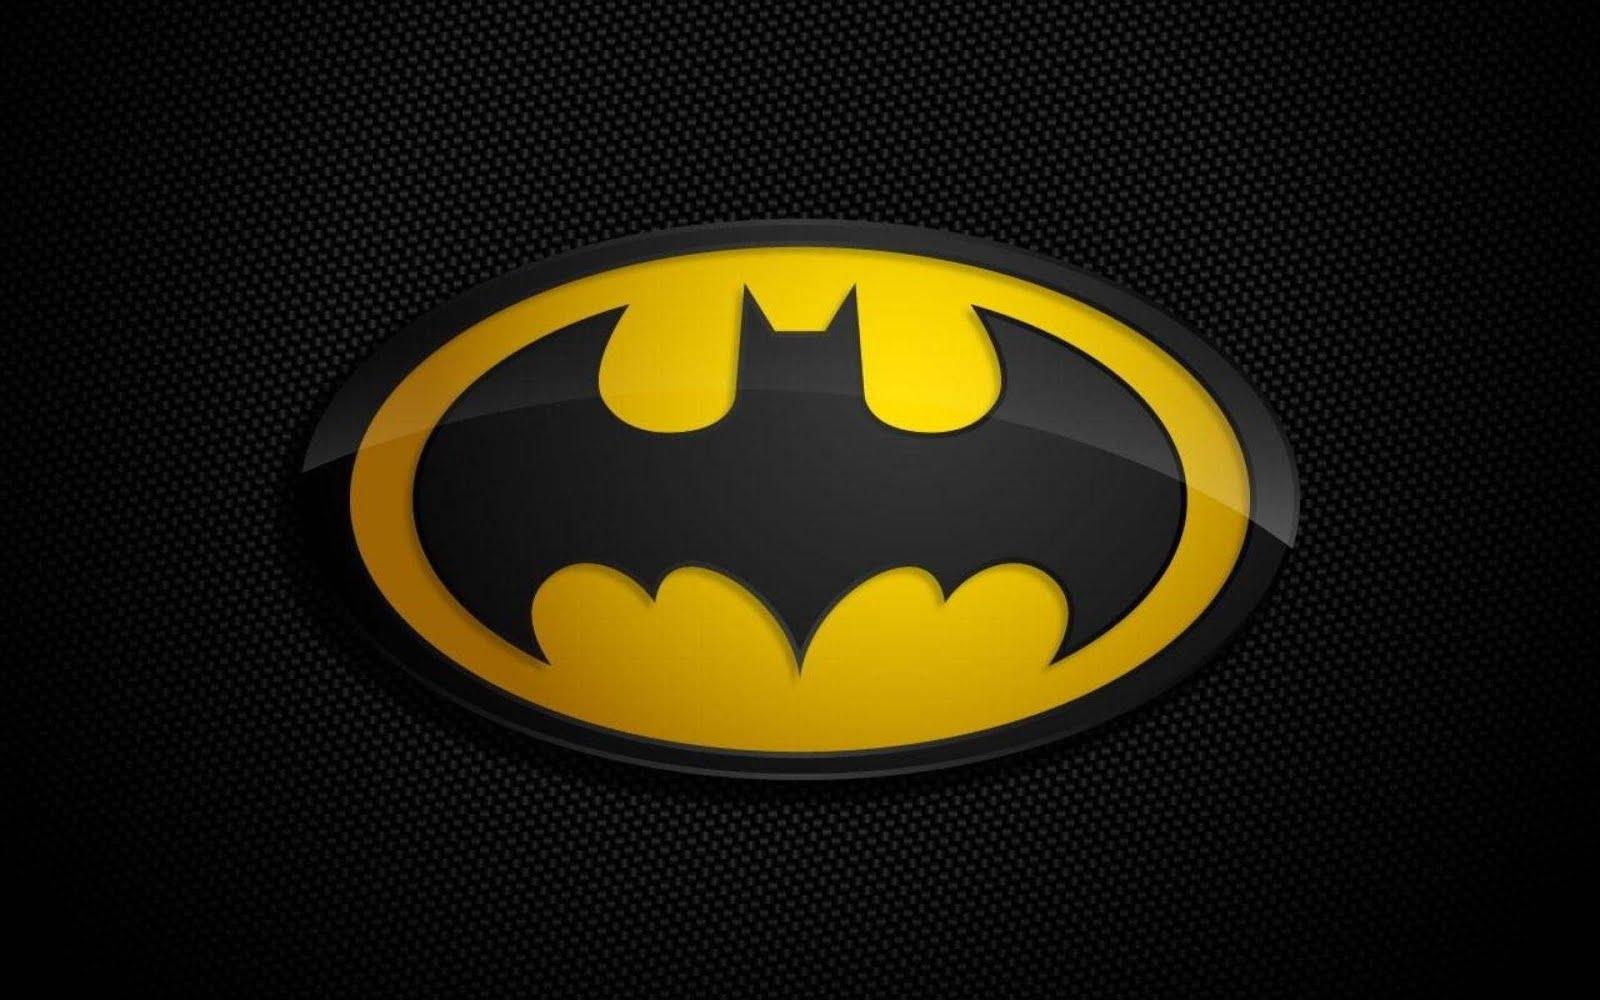 Batman cartoon movies wallpaper cartoon wallpaper - Batman wallpaper cartoon ...